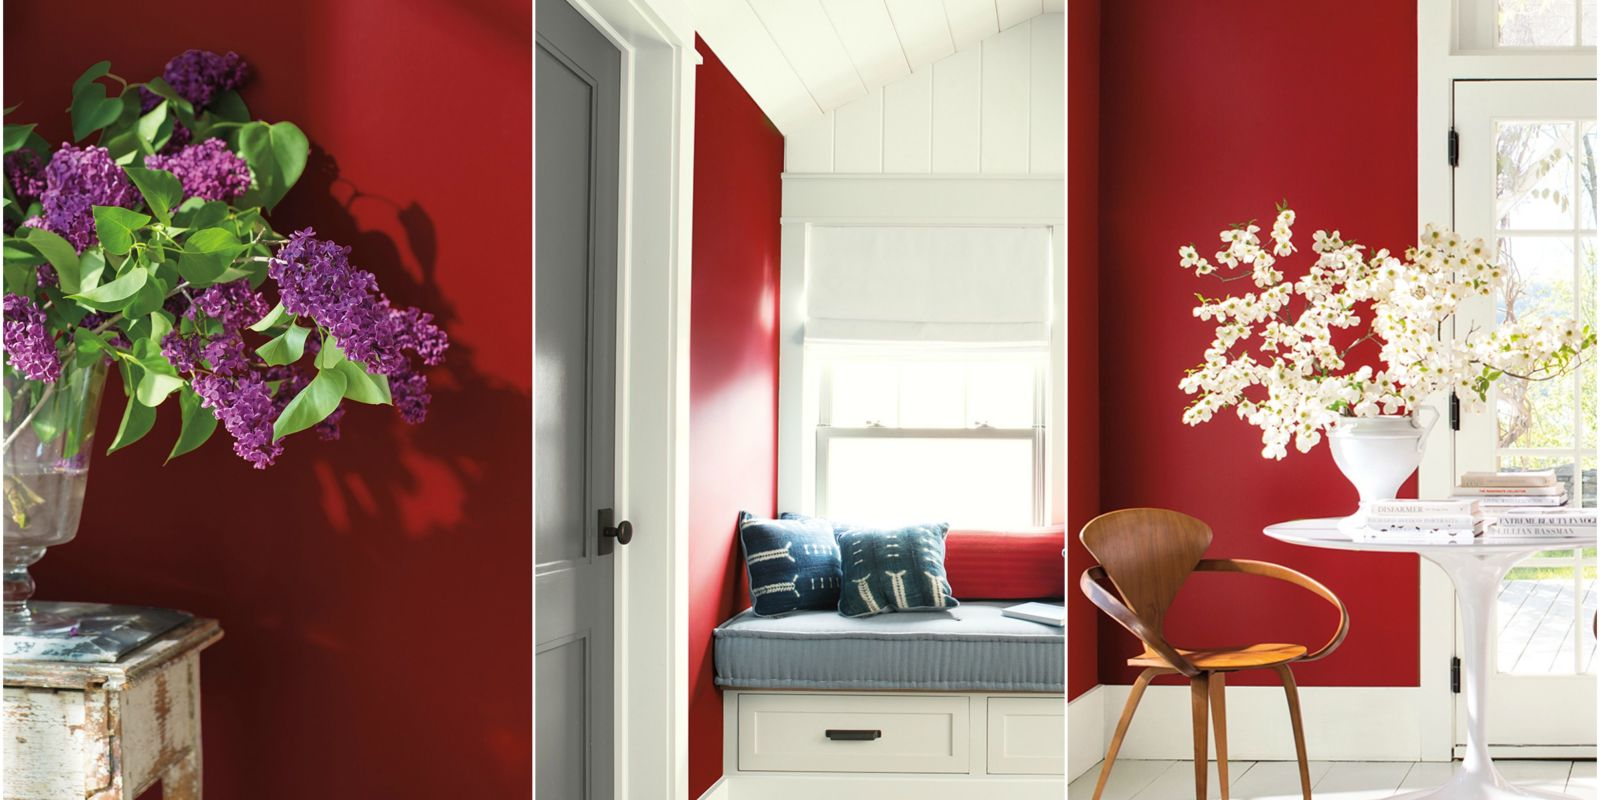 sofa designs in red colour leonardo leather regular recliner black caliente is benjamin moore's of the year 2018 ...